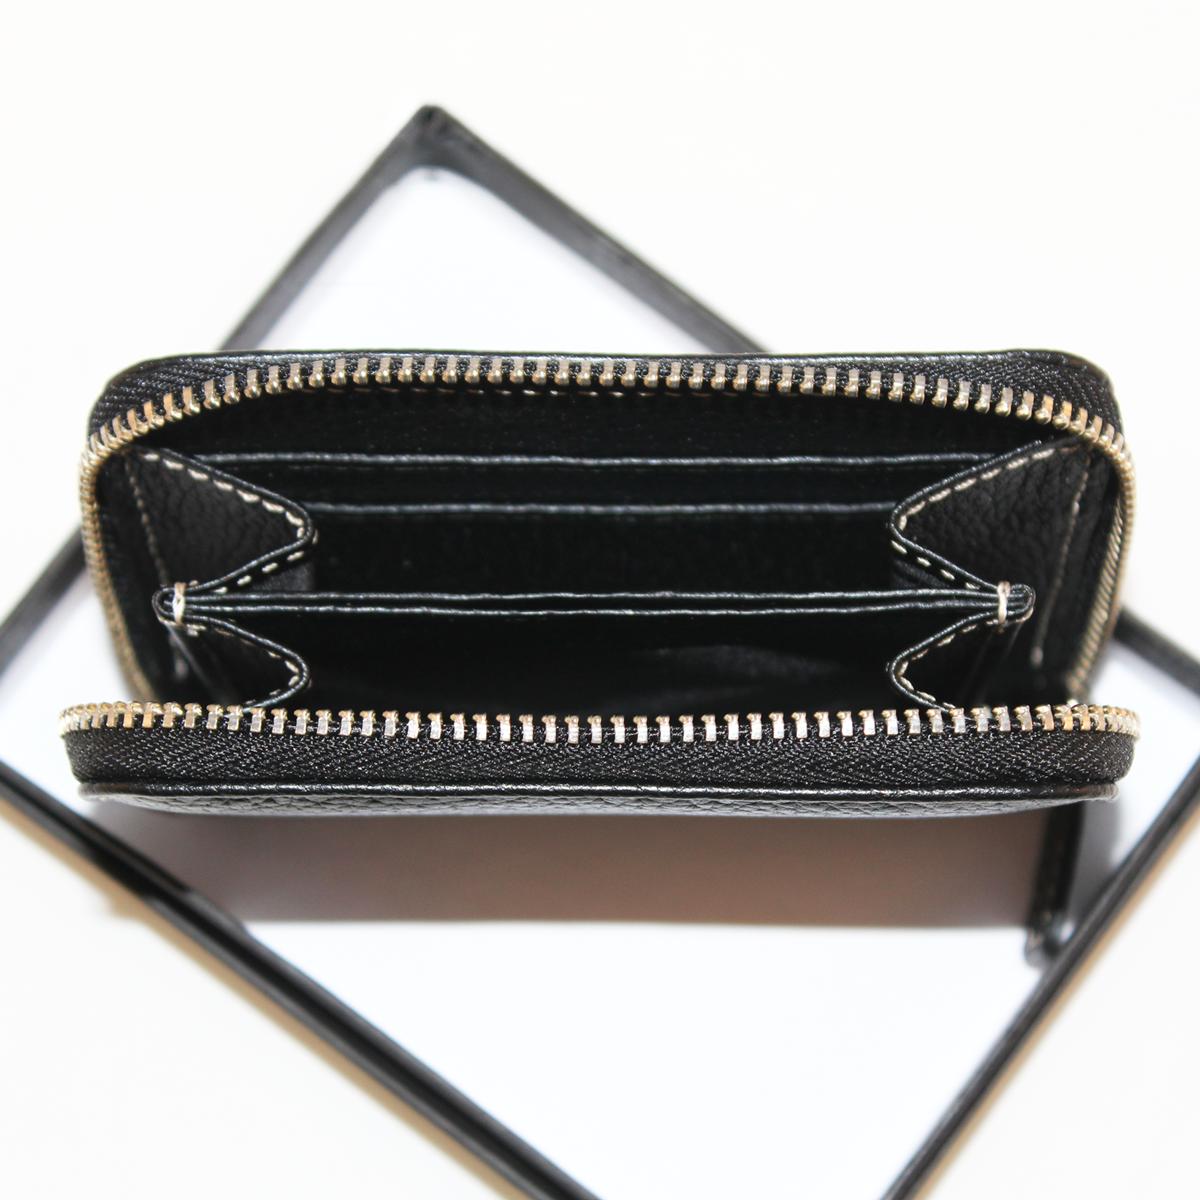 New Wallet Black